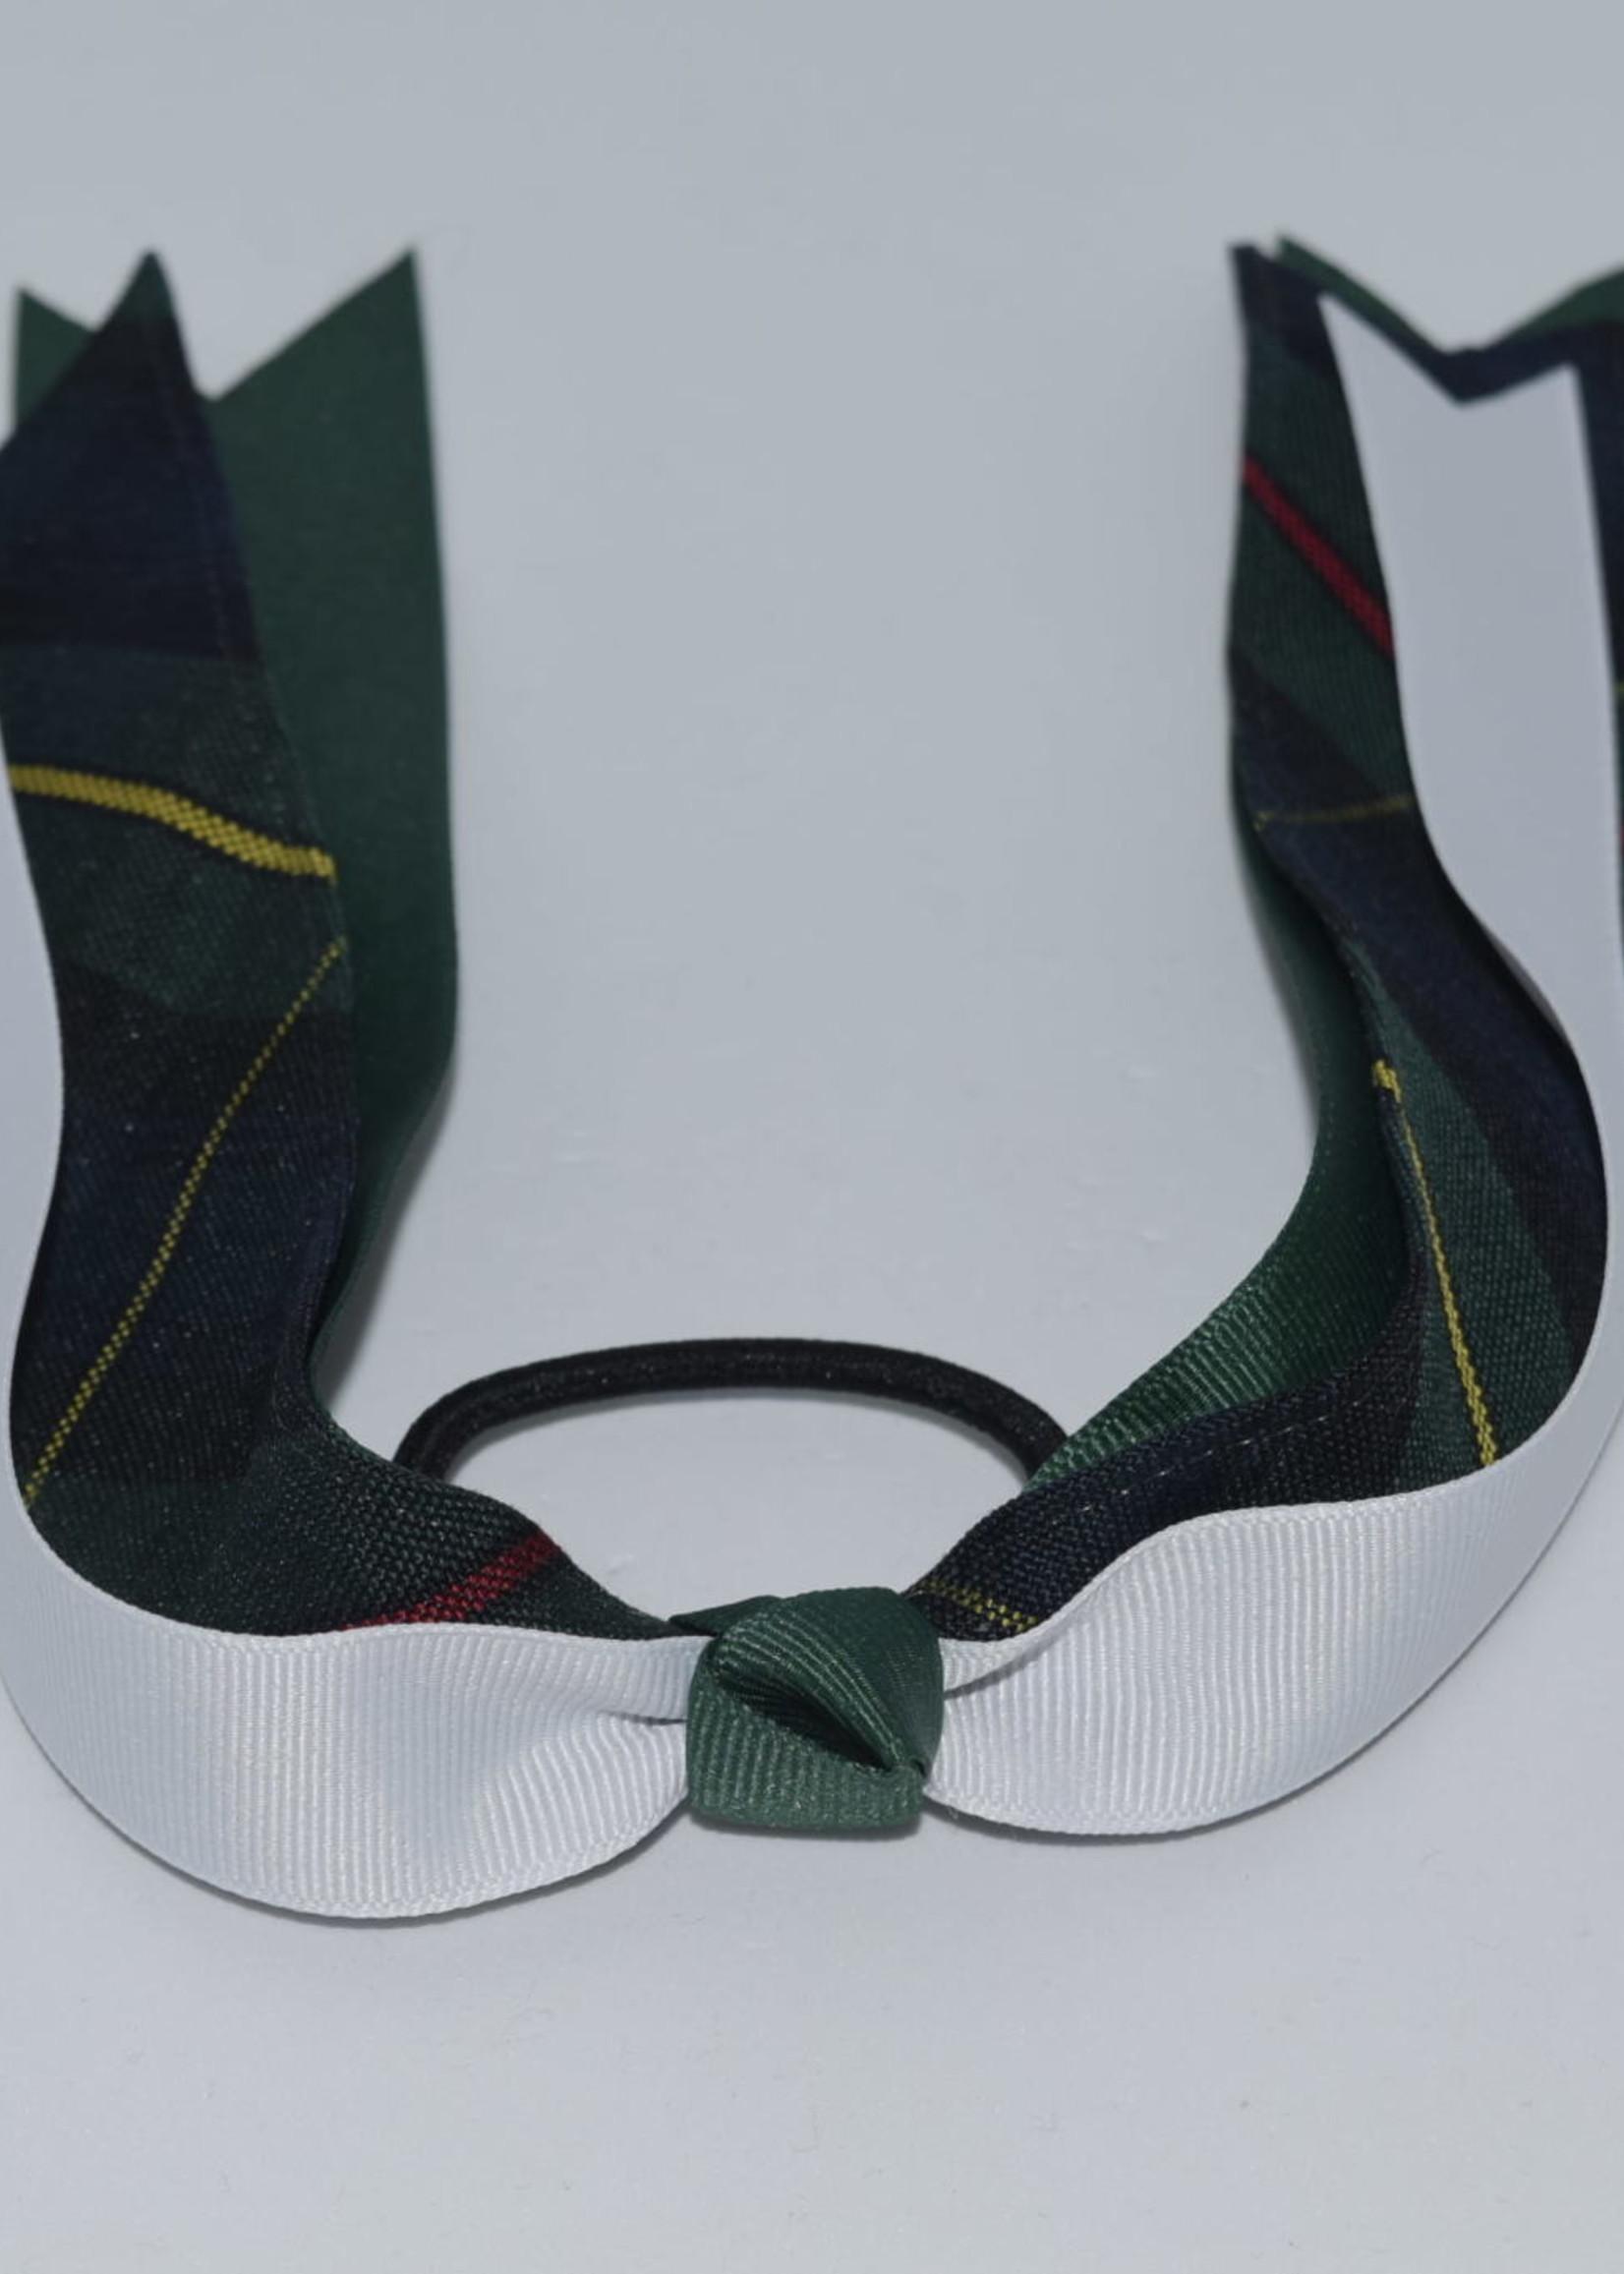 Wide Plaid & Grosgrain Ribbon Streamer Bow P83 FOR WHT